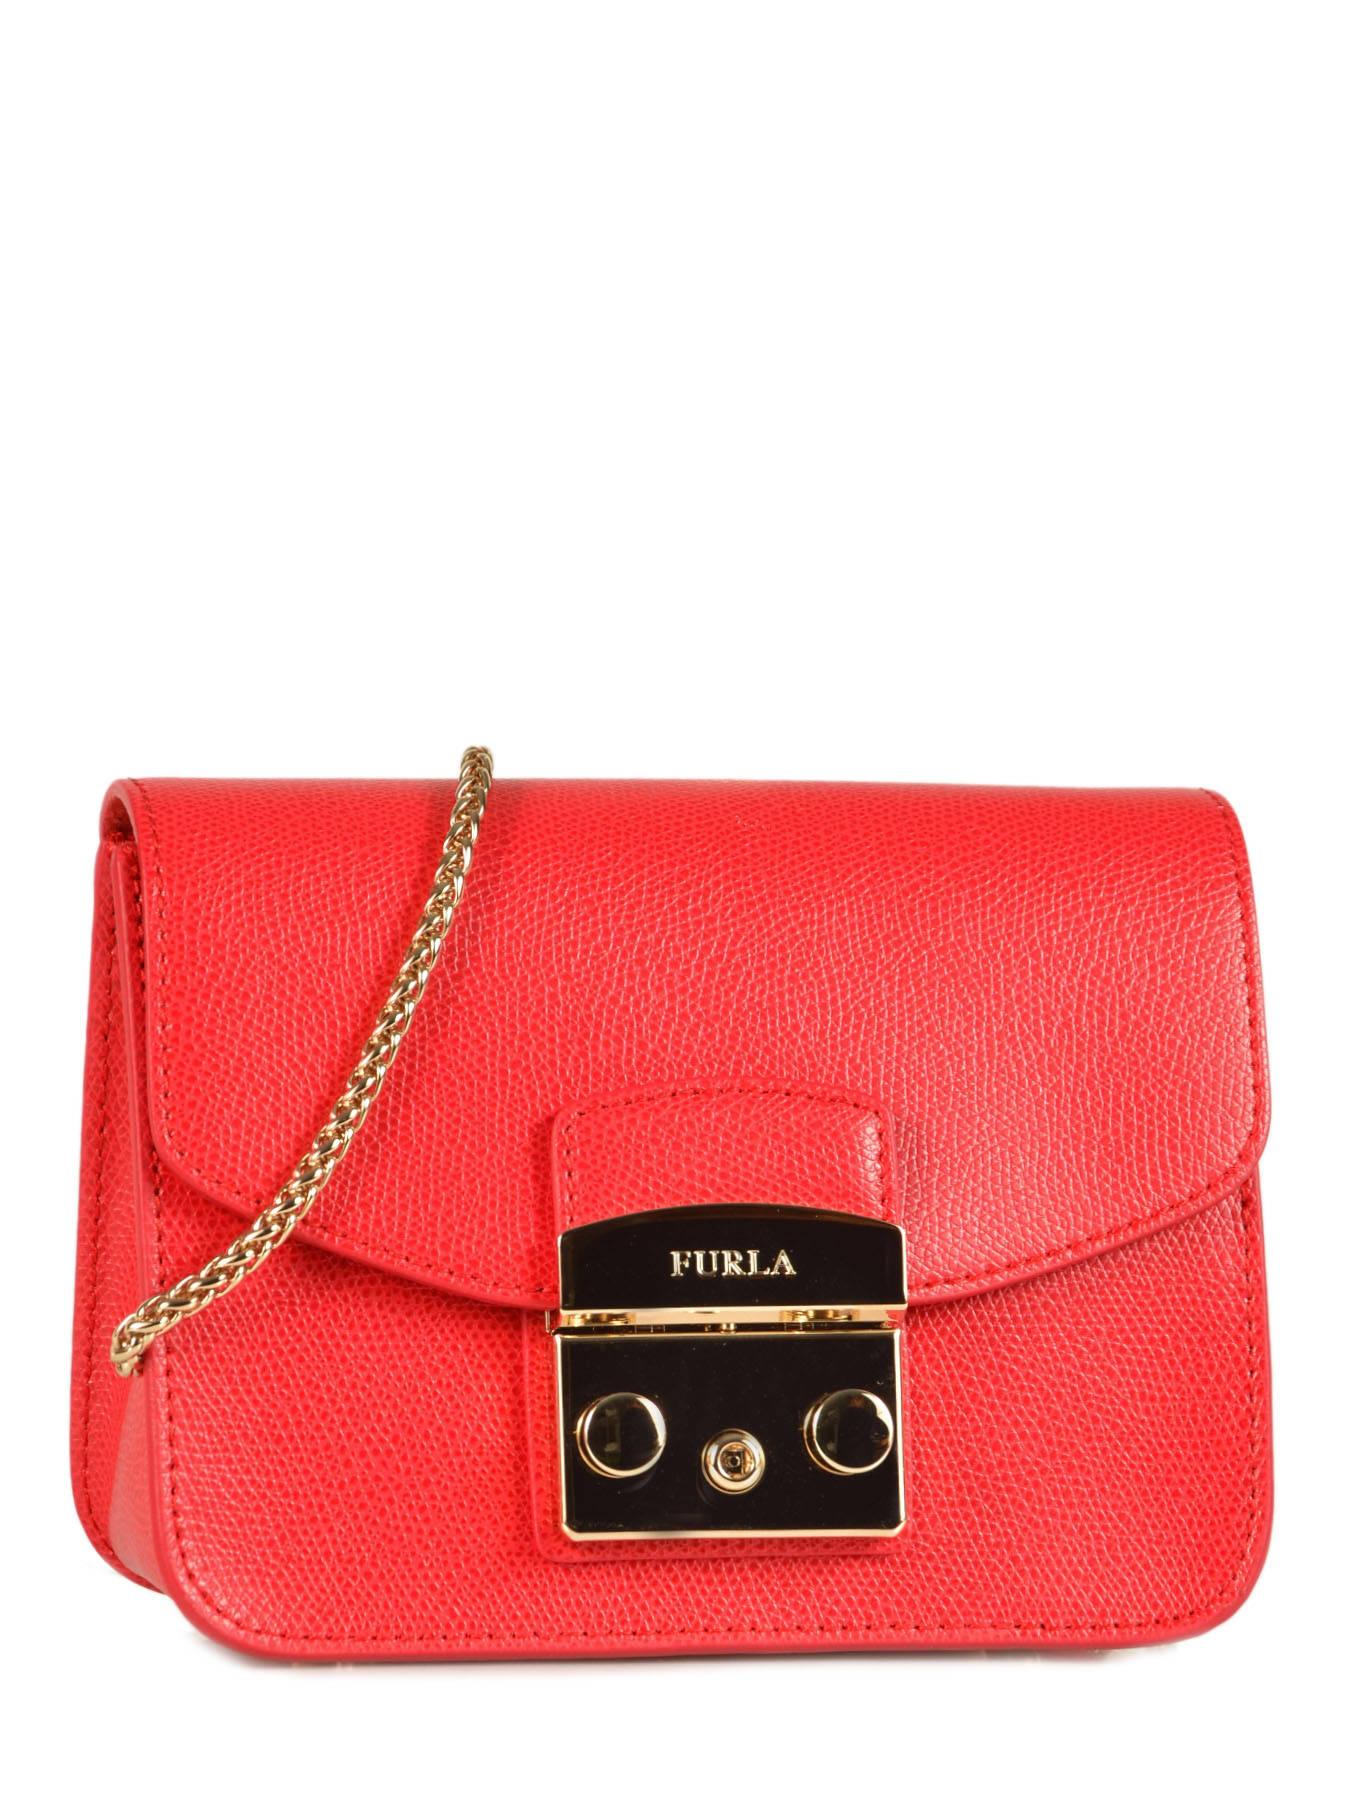 Red Furla Handbag Handbag Reviews 2018